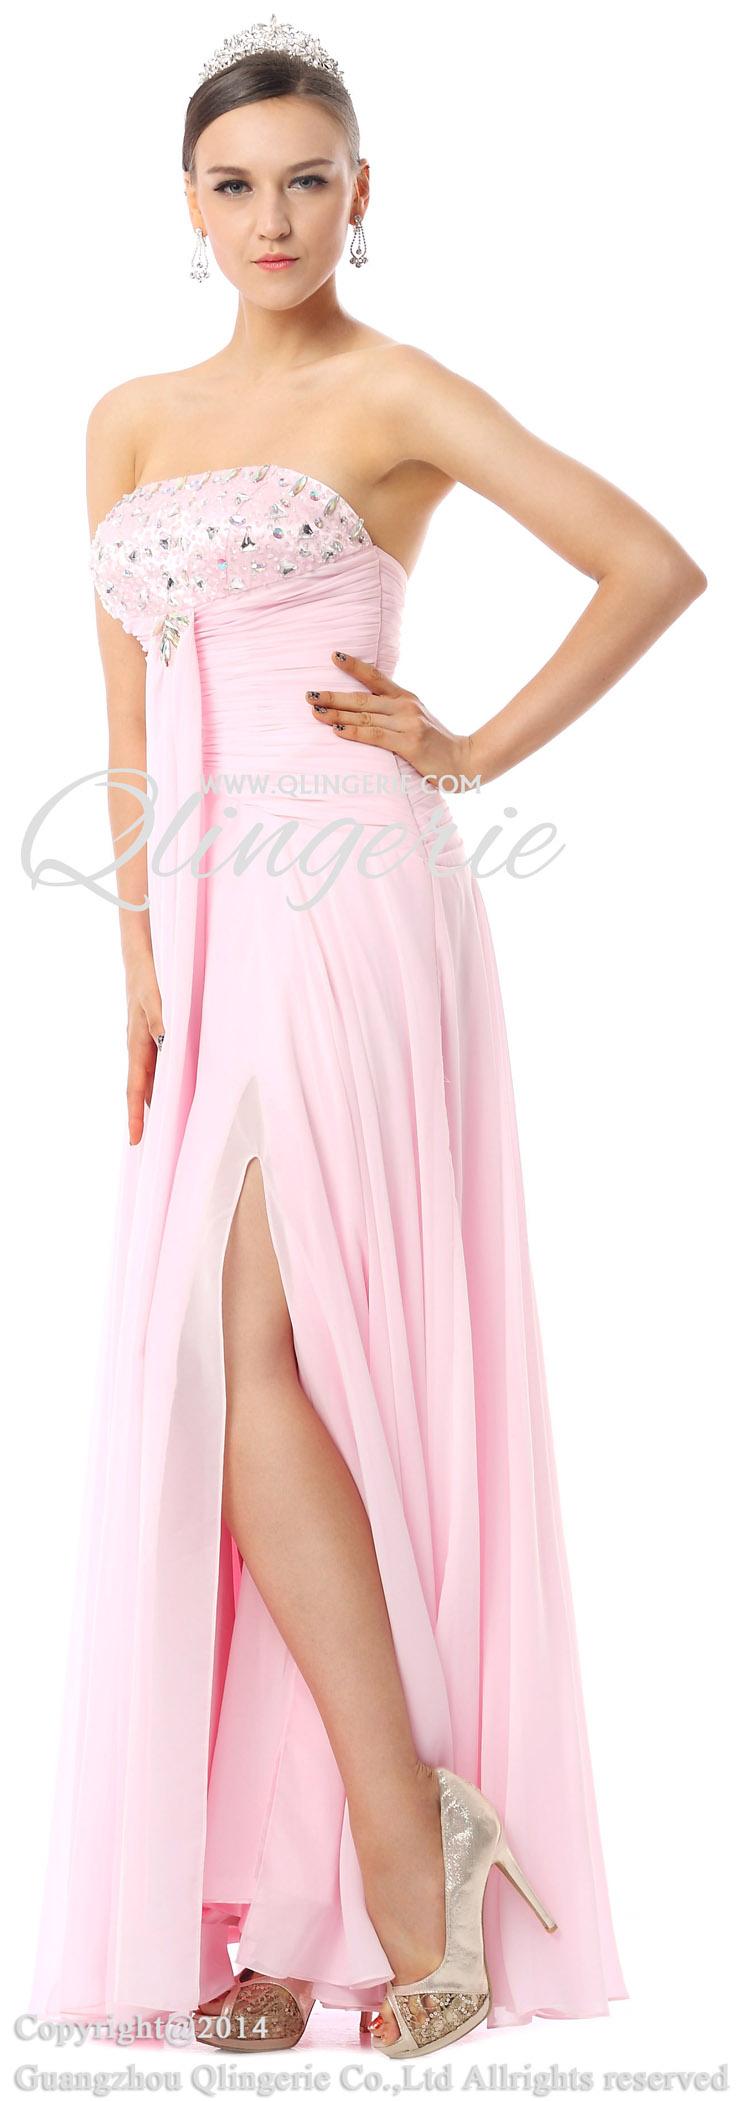 2018 fancy pink sheath strapless splitfront crystal floor